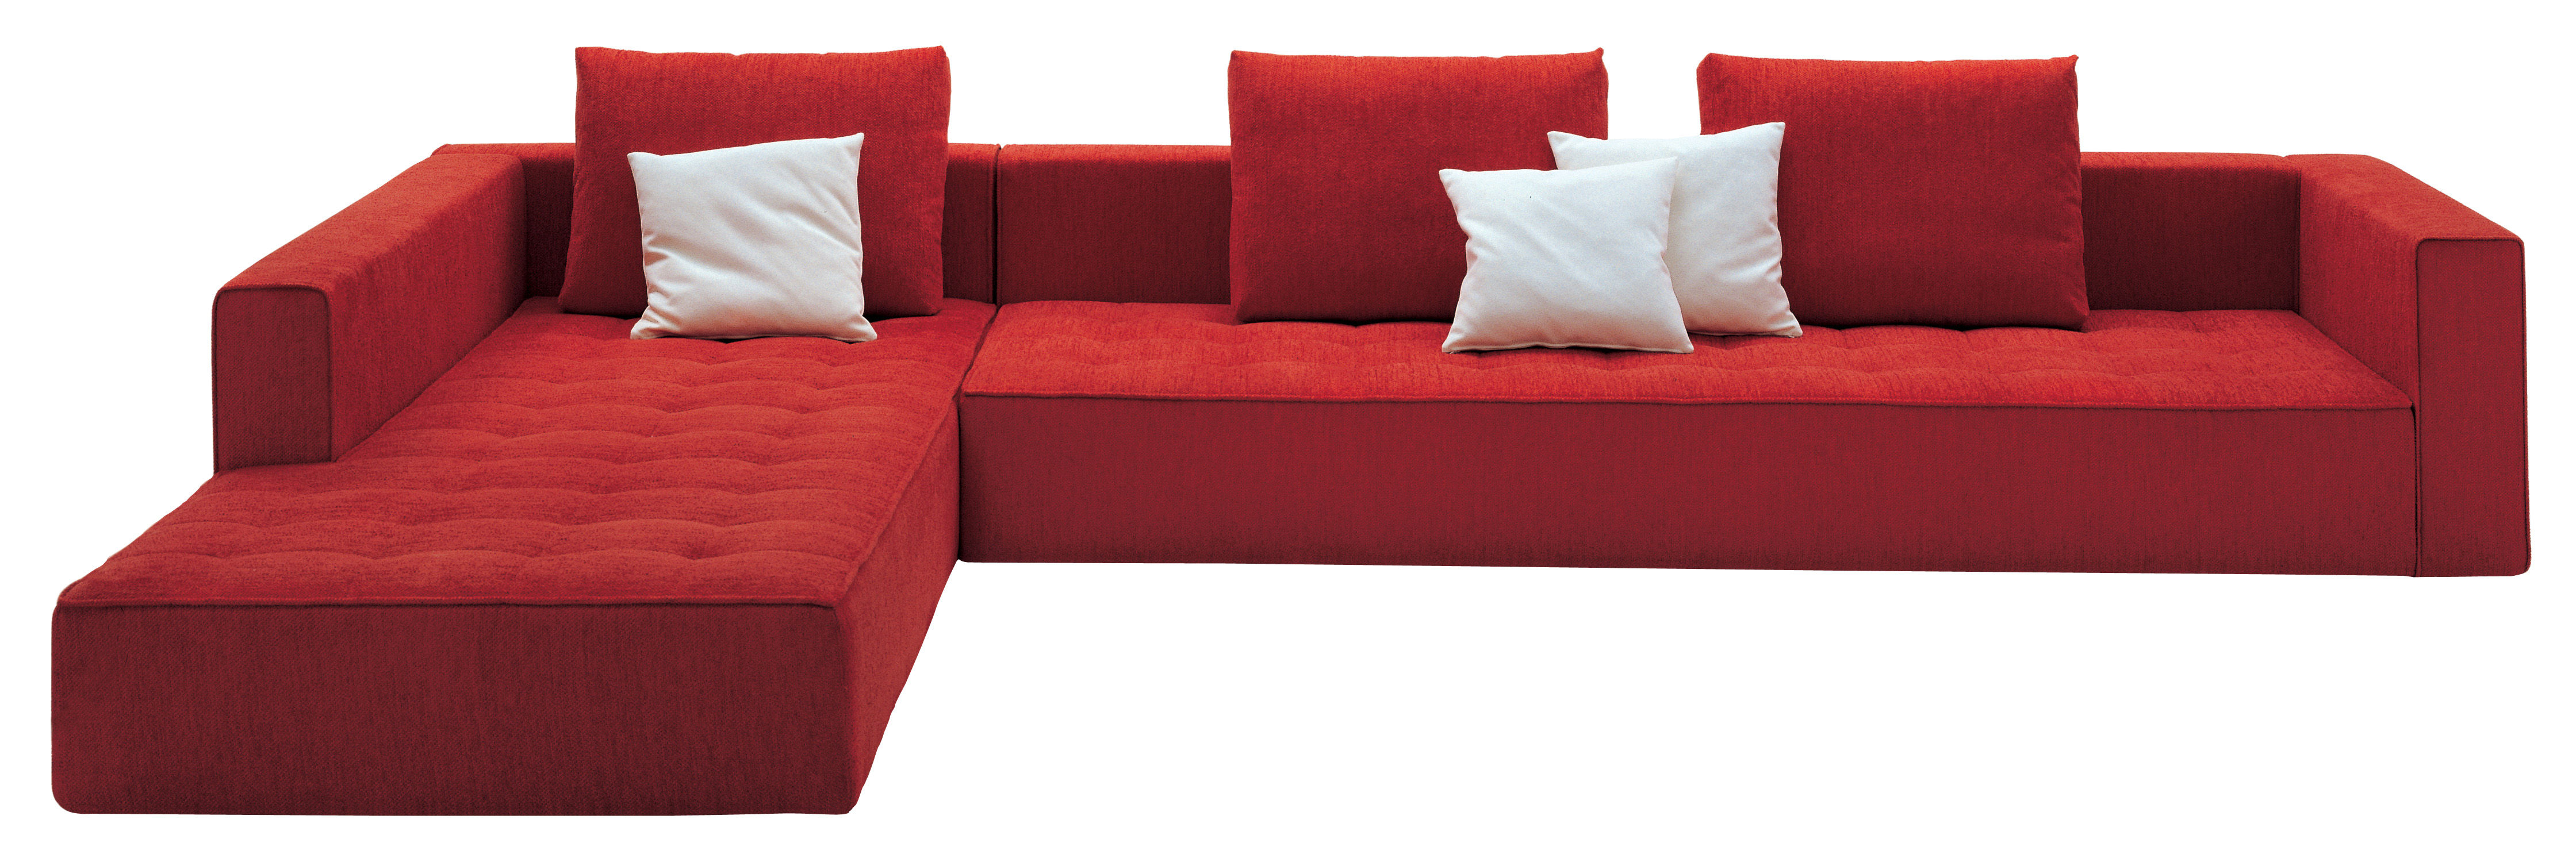 canap d 39 angle kilt tissu l 300 cm tissu rouge zanotta. Black Bedroom Furniture Sets. Home Design Ideas